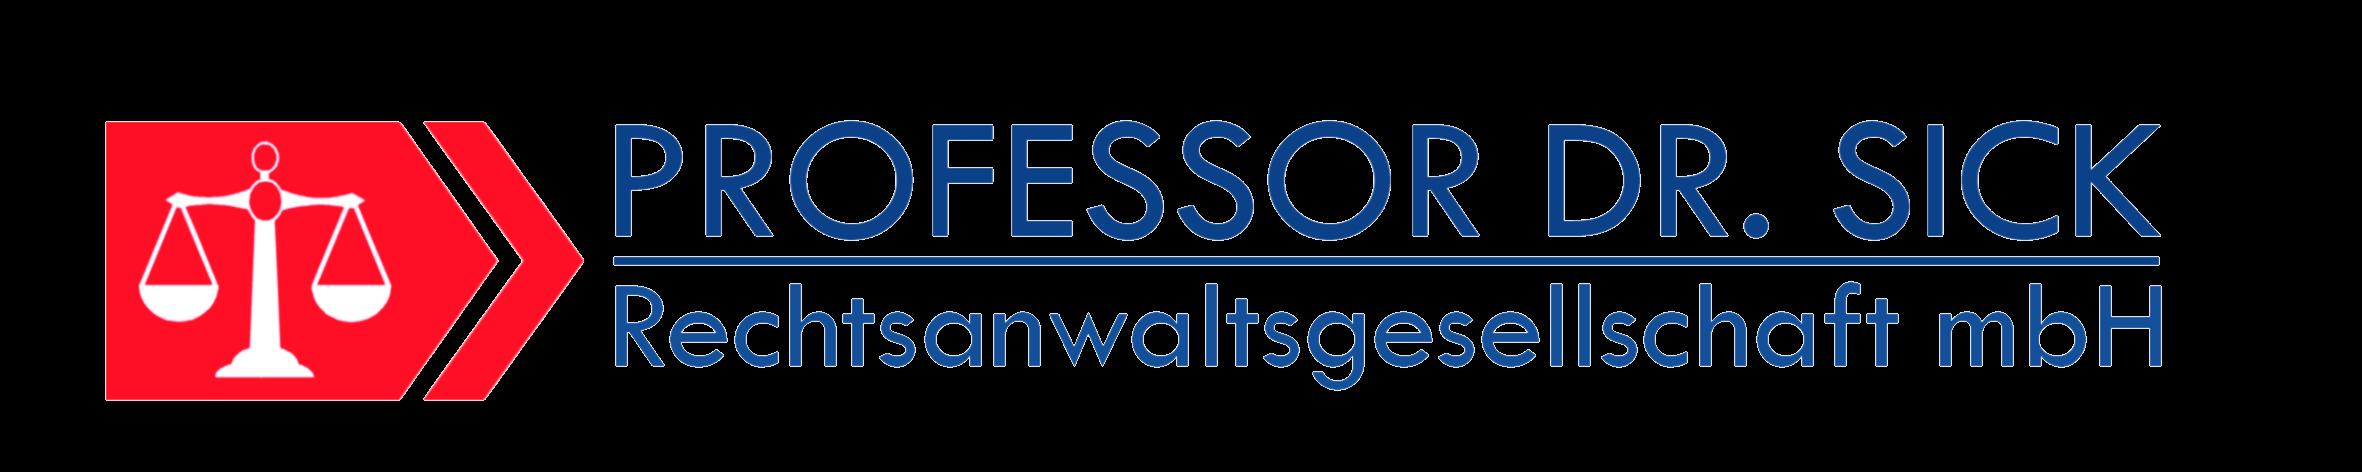 Professor Dr. Sick Rechtsanwalts GmbH